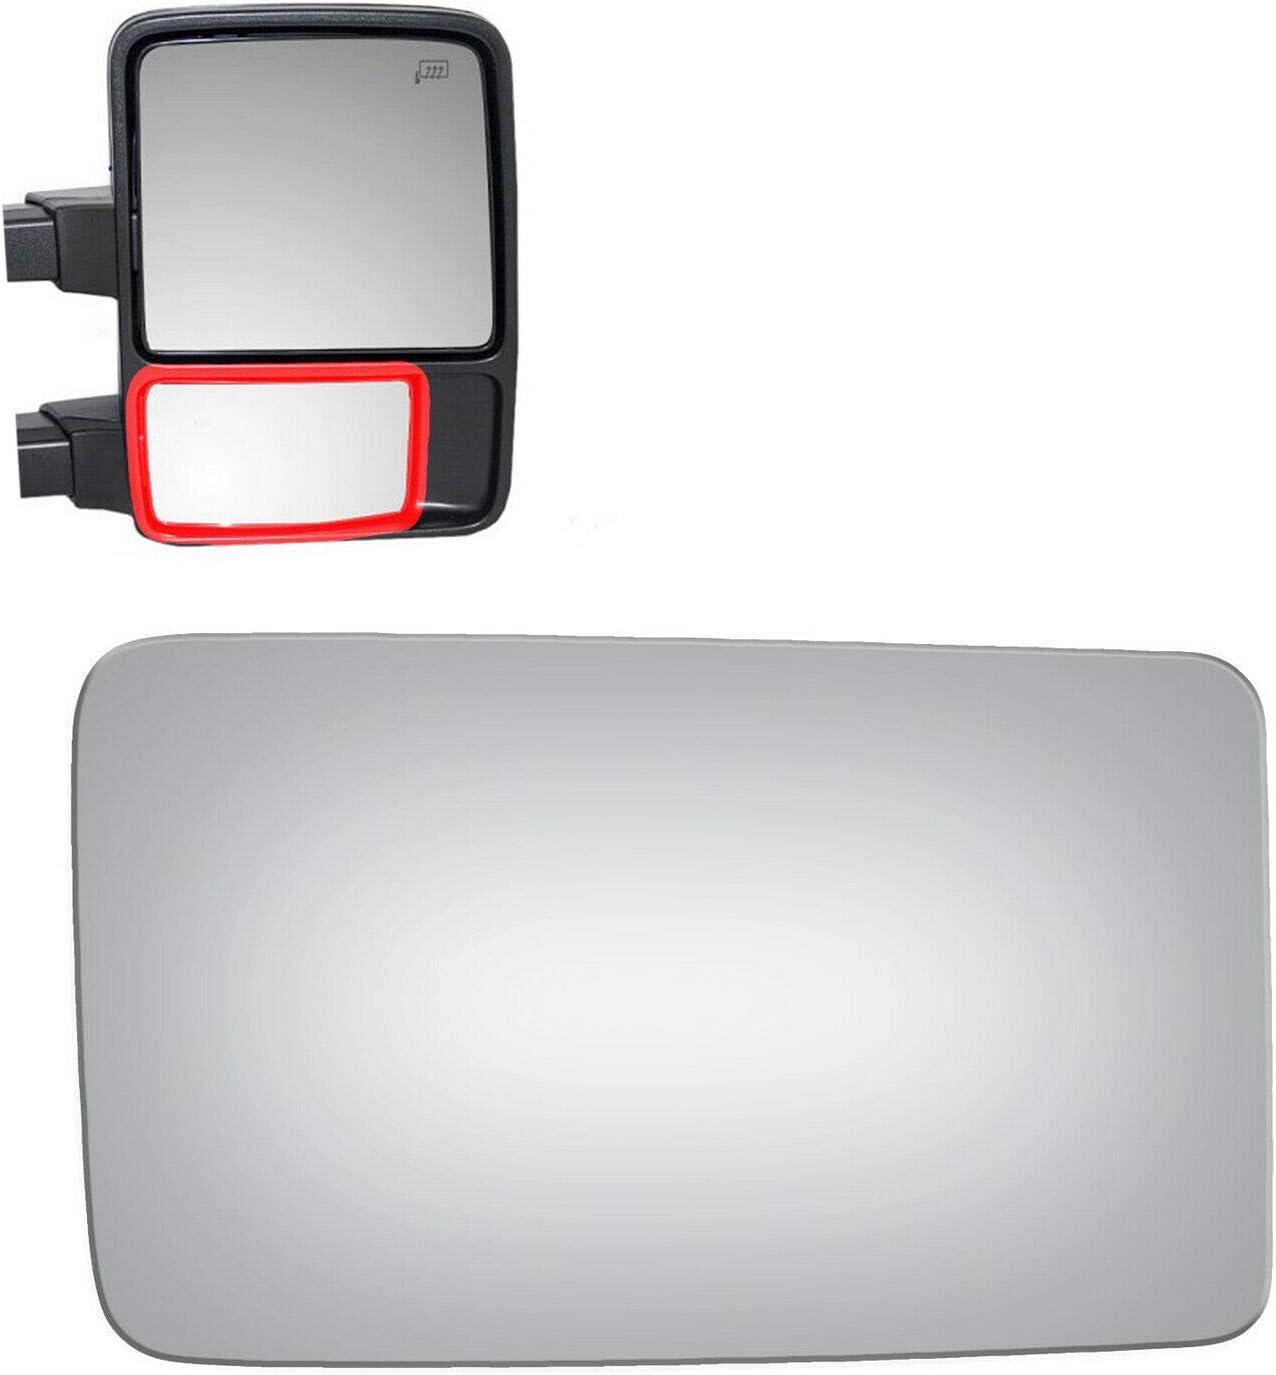 Ford E-150 E-250 E-350 F-250 F-350 F-450 Left driver side mirror glass lens 2729